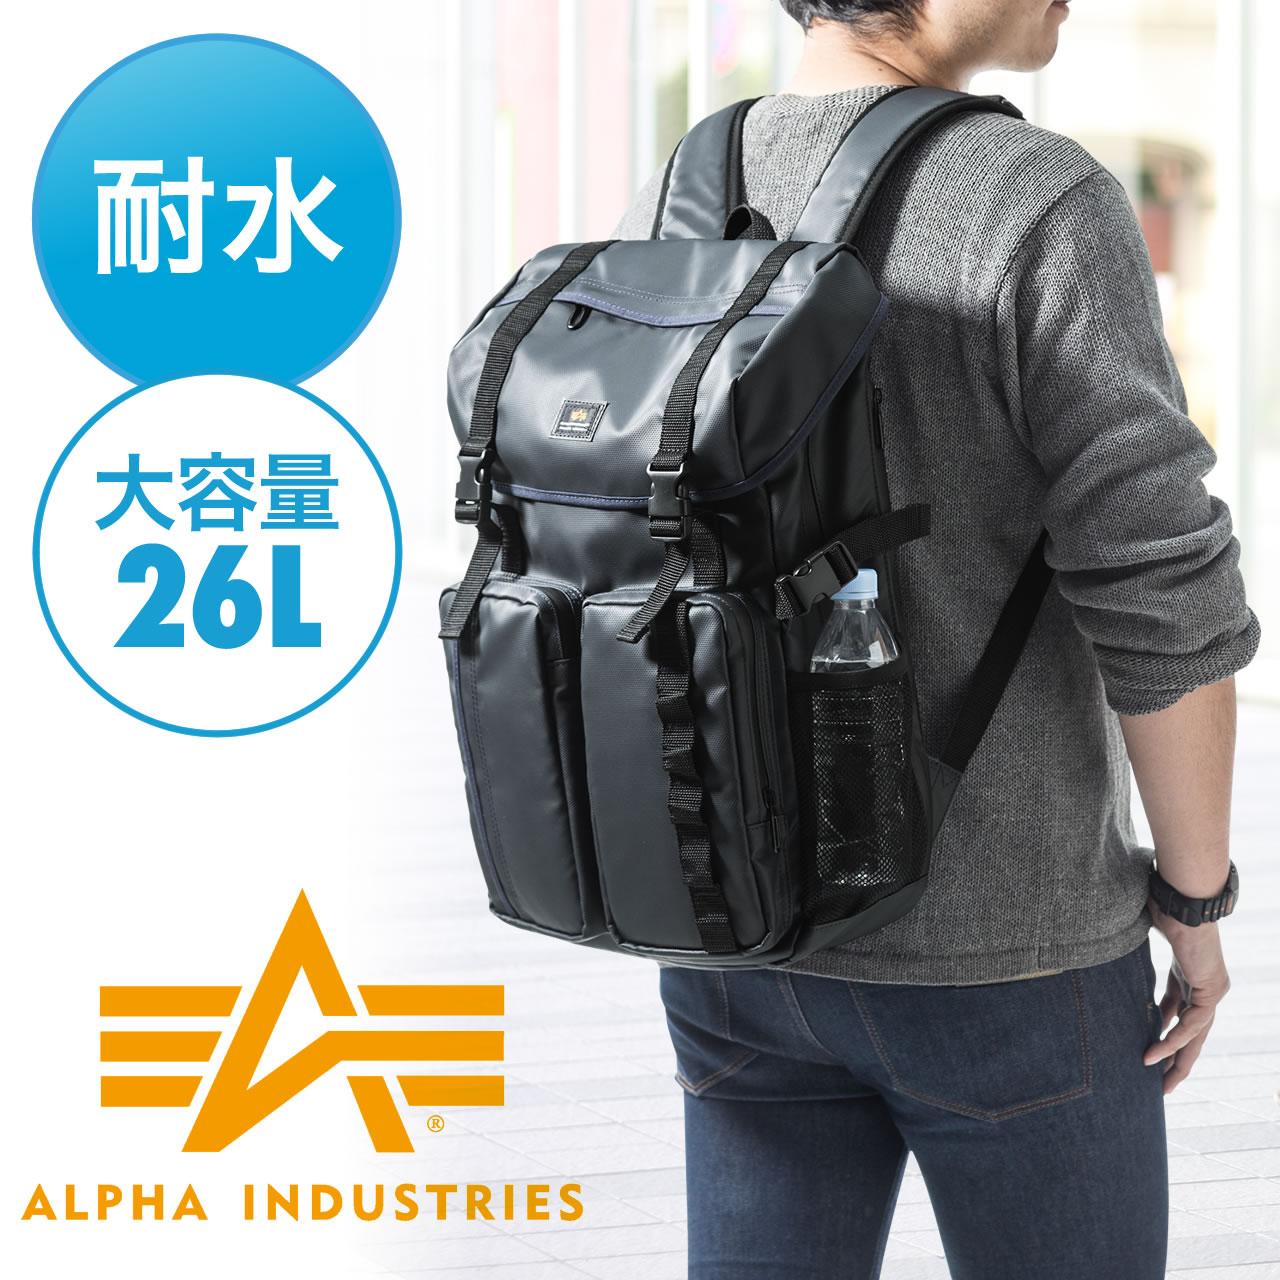 e2ada8d13a3e スクエアリュック・バックパック(ビジネス・A4・通勤・通学・iPad・